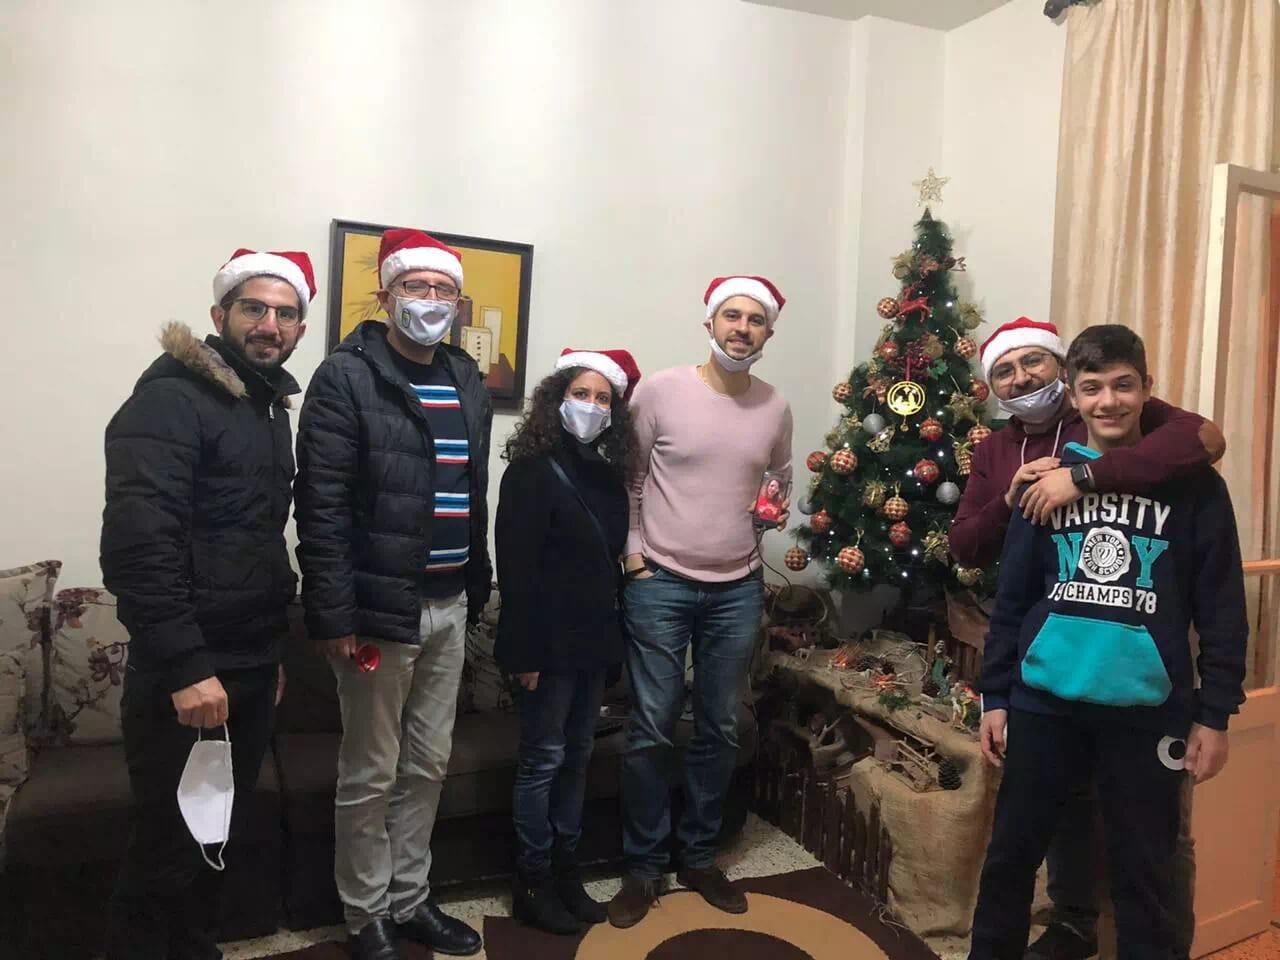 https://eundemia.sirv.com/Images/christmas/456900.webp